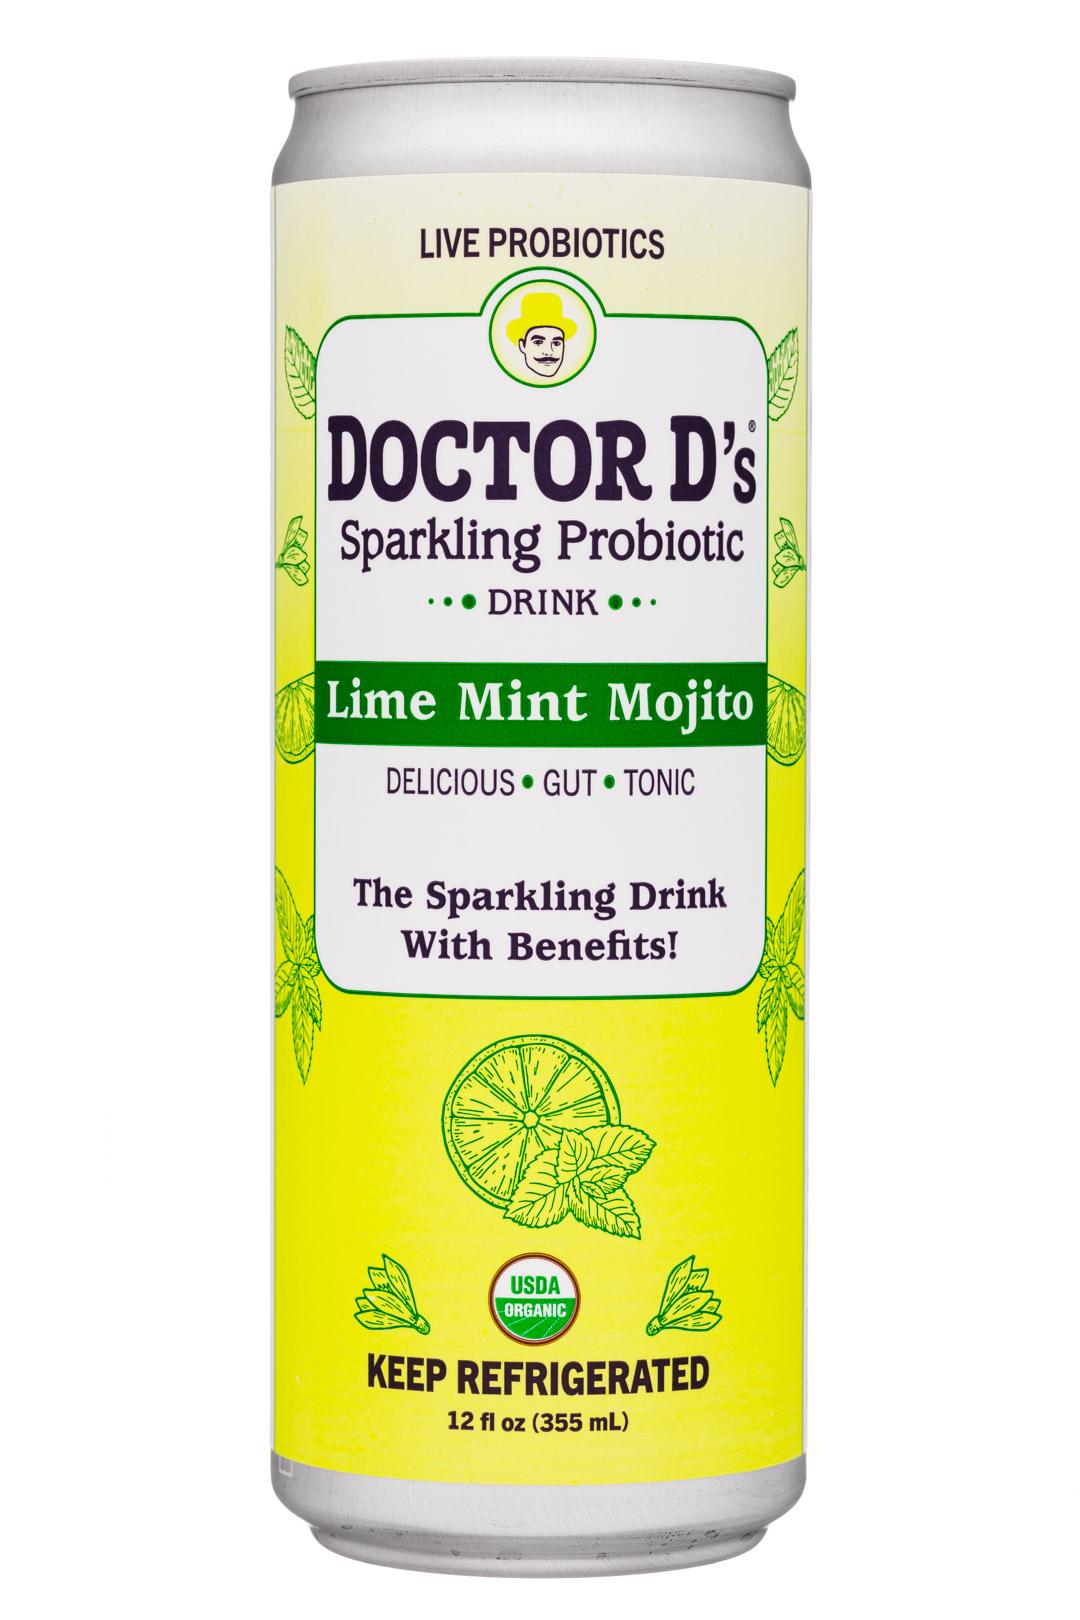 Doctor D's : DoctorDs-12oz-2020-SparklingProbiotic-LimeMintMojito-Front